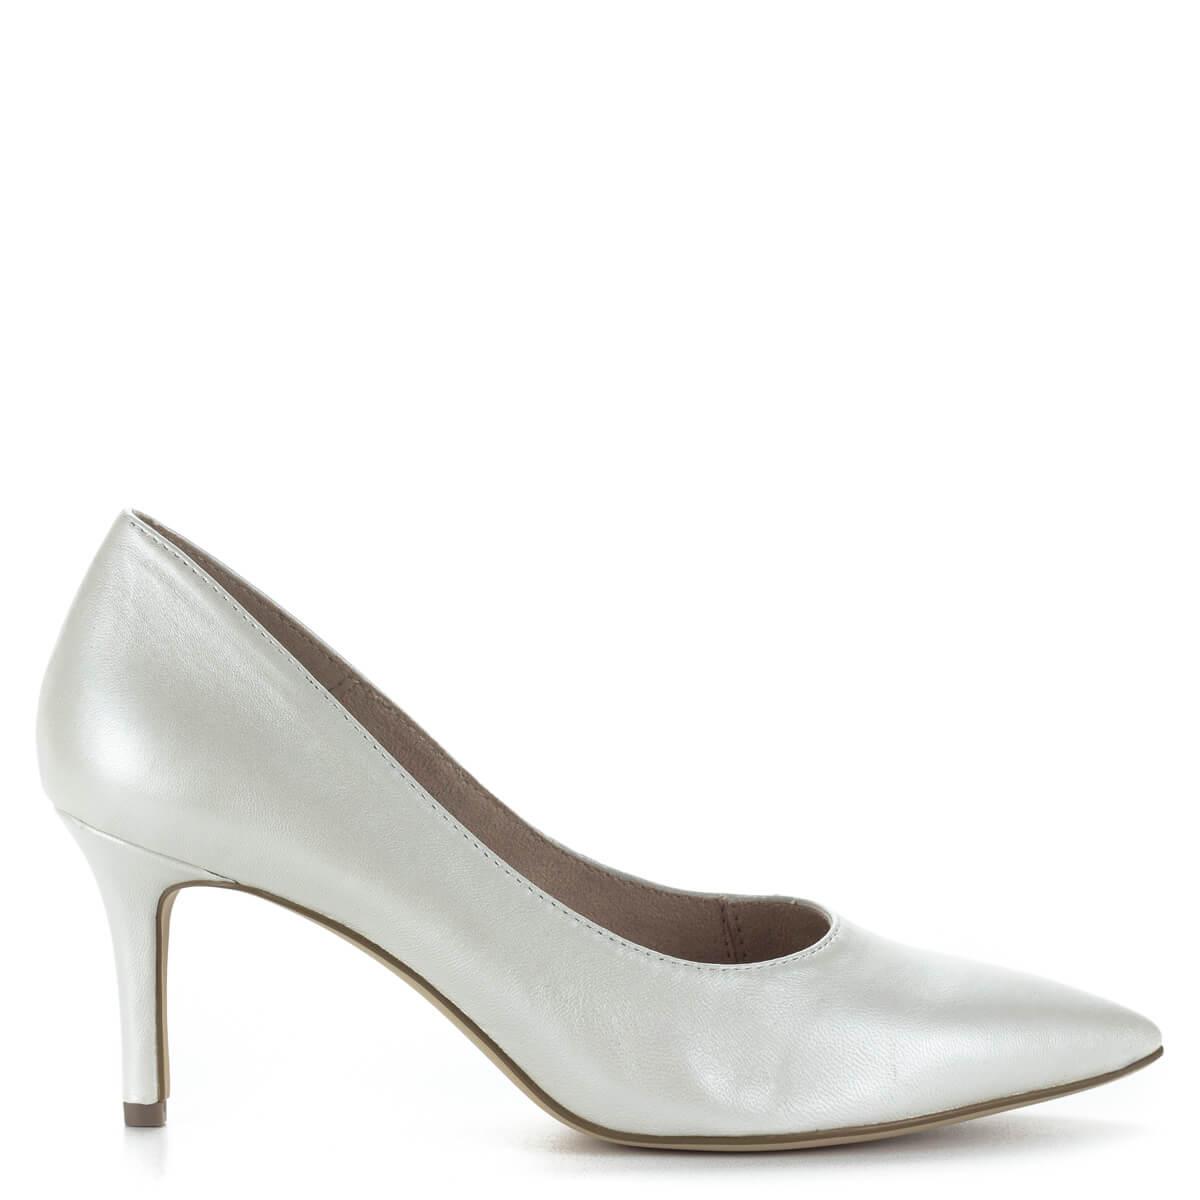 ... Fehér Tamaris magassarkú cipő 7 centis sarokkal 87f6074716